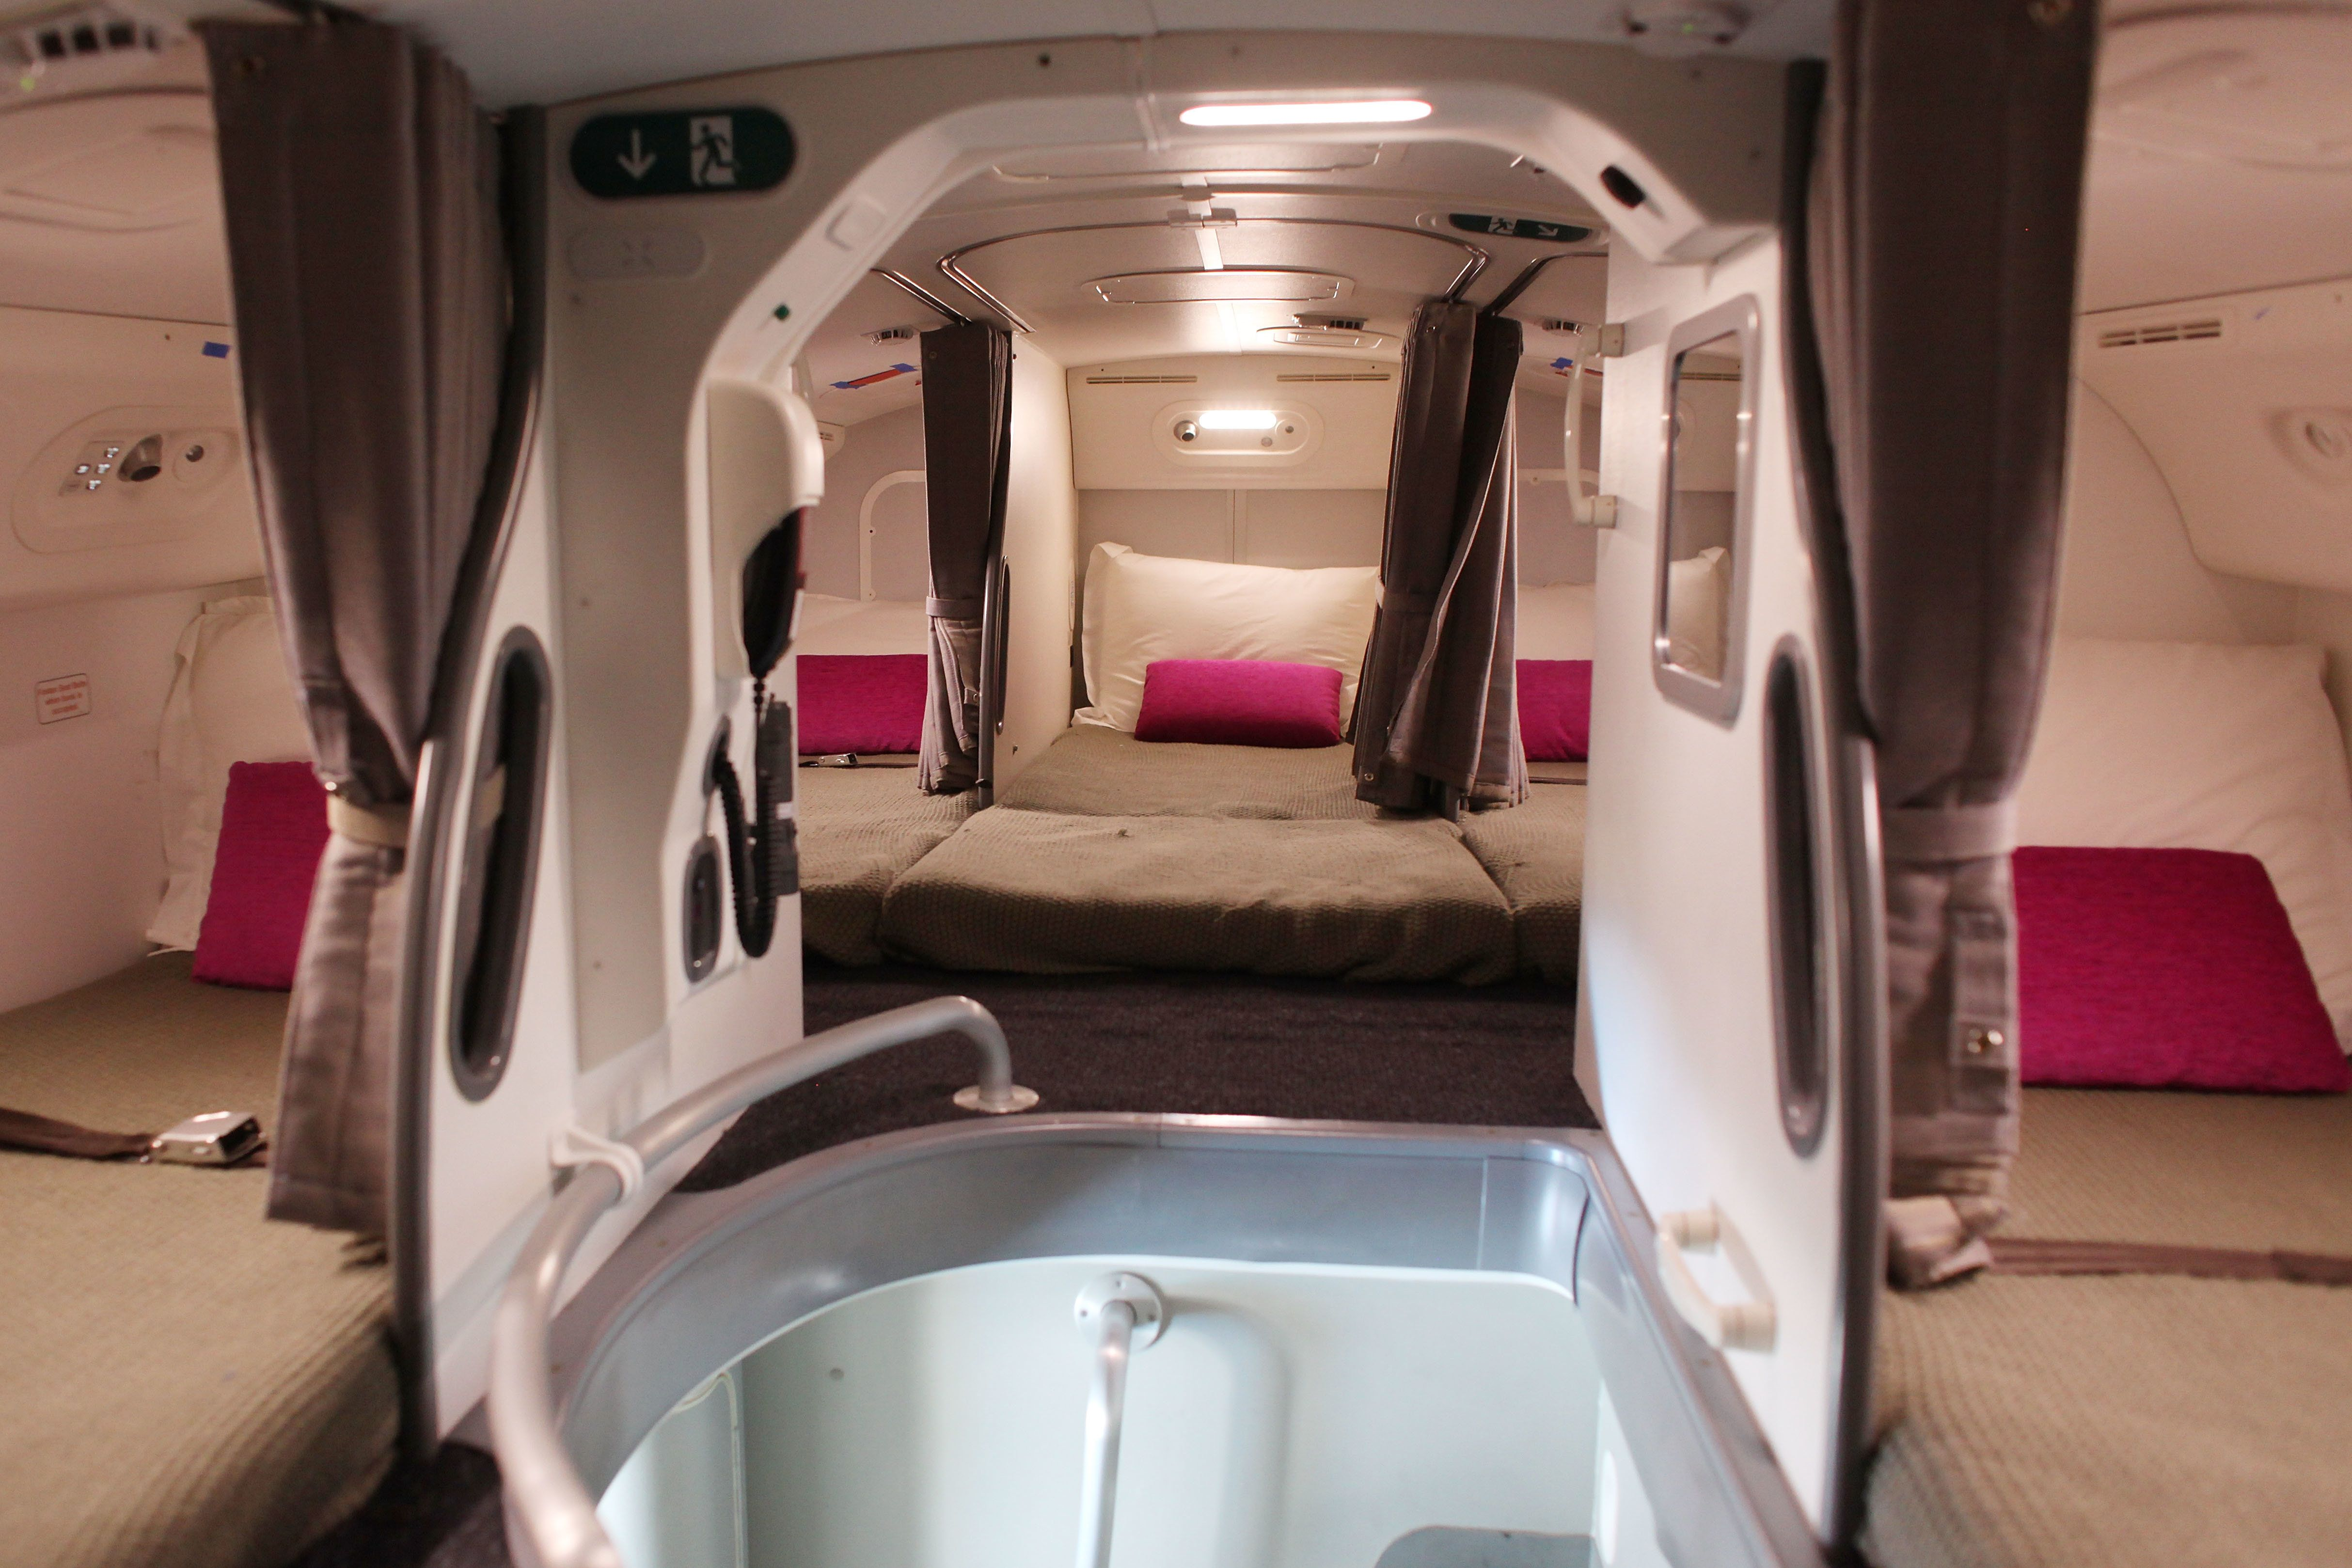 Crew sleeping quarters on the Boeing 787 Dreamliner in 2012